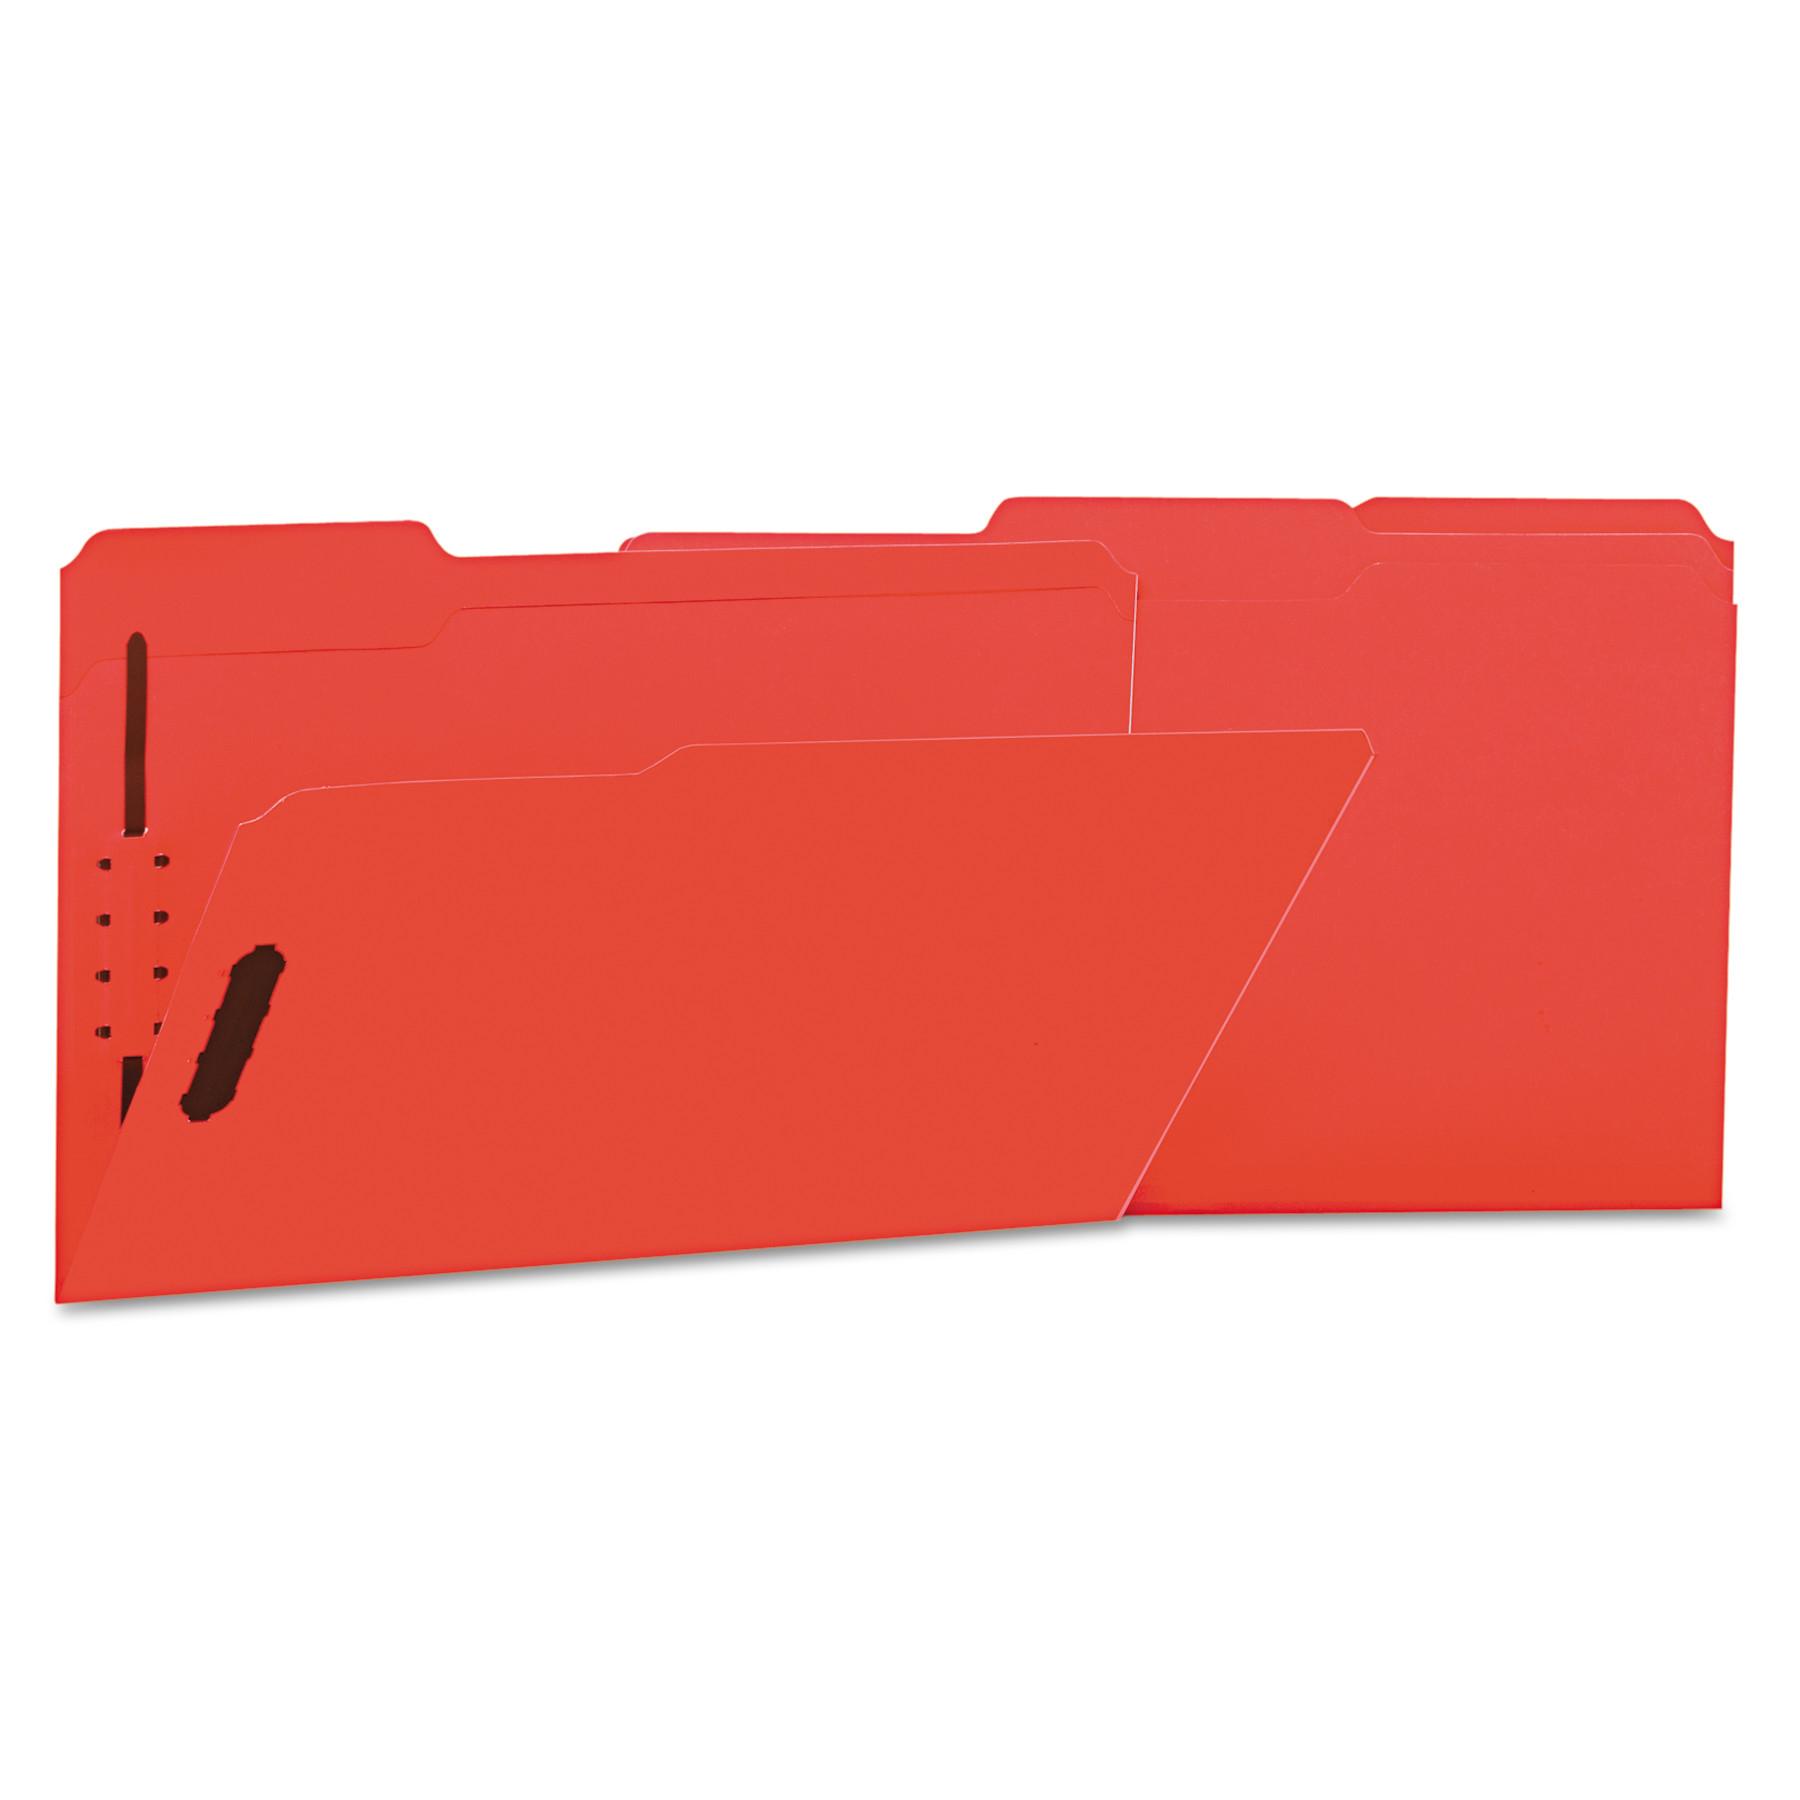 Deluxe Reinforced Top Tab Folders, 2 Fasteners, 1/3 Tab, Legal, Red, 50/Box